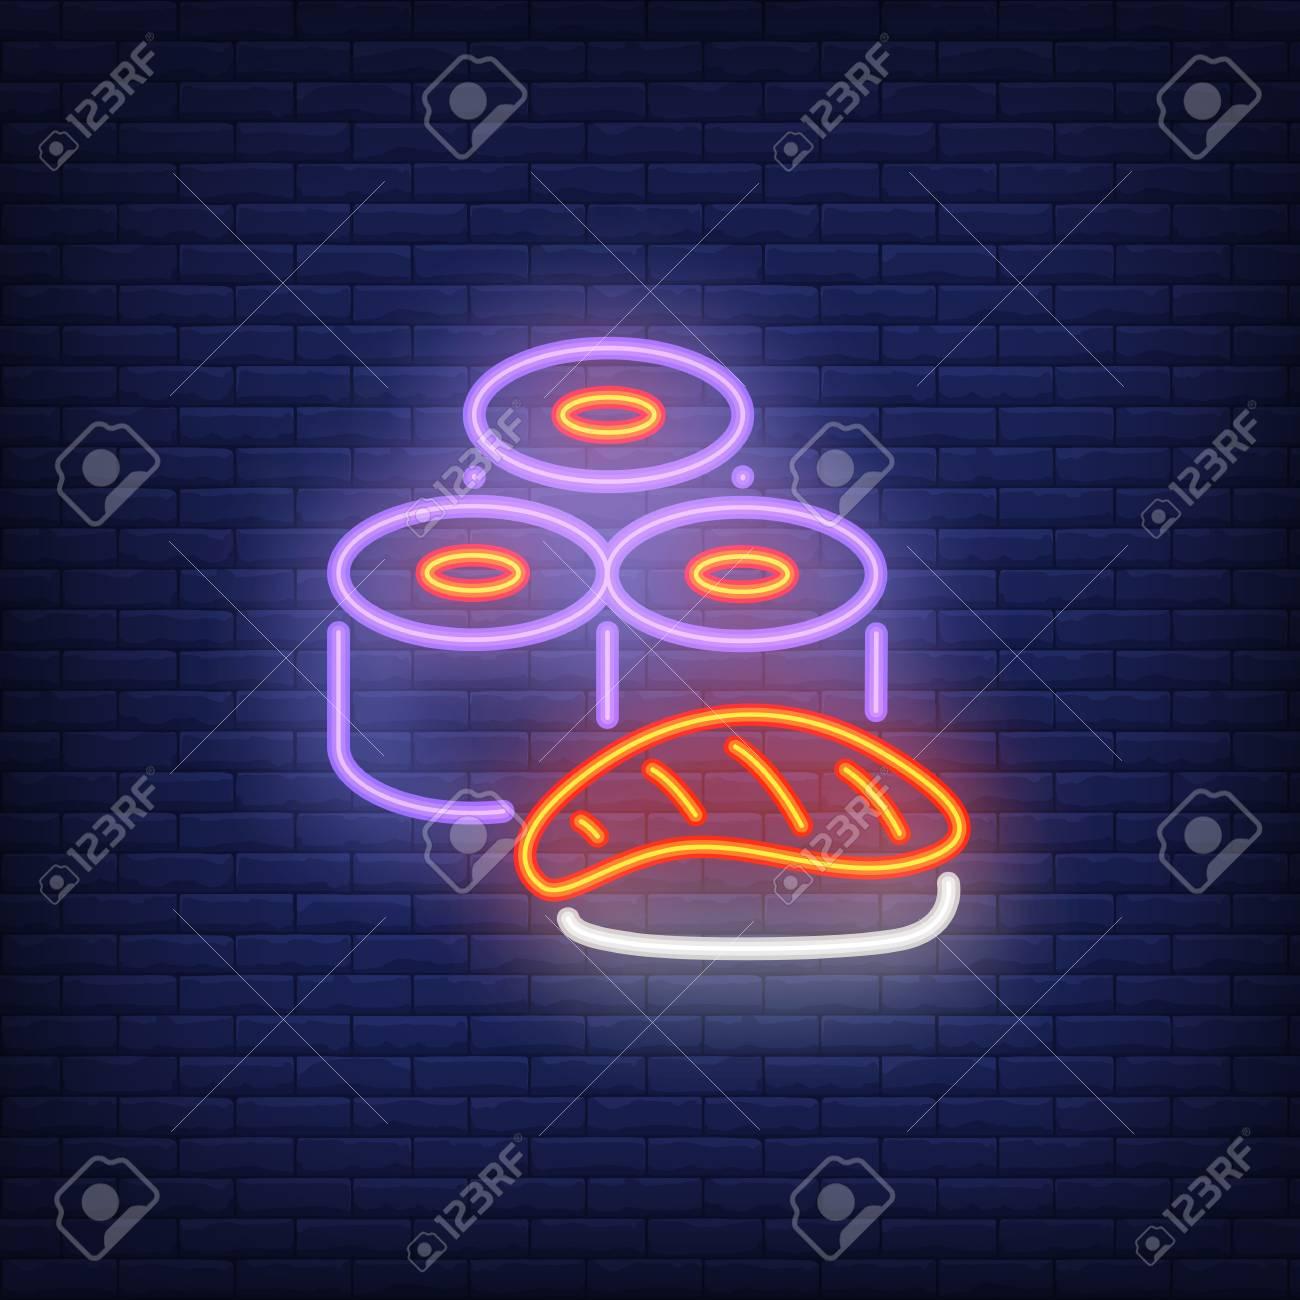 Sushi set neon sign  Food, restaurant, Japanese cuisine concept